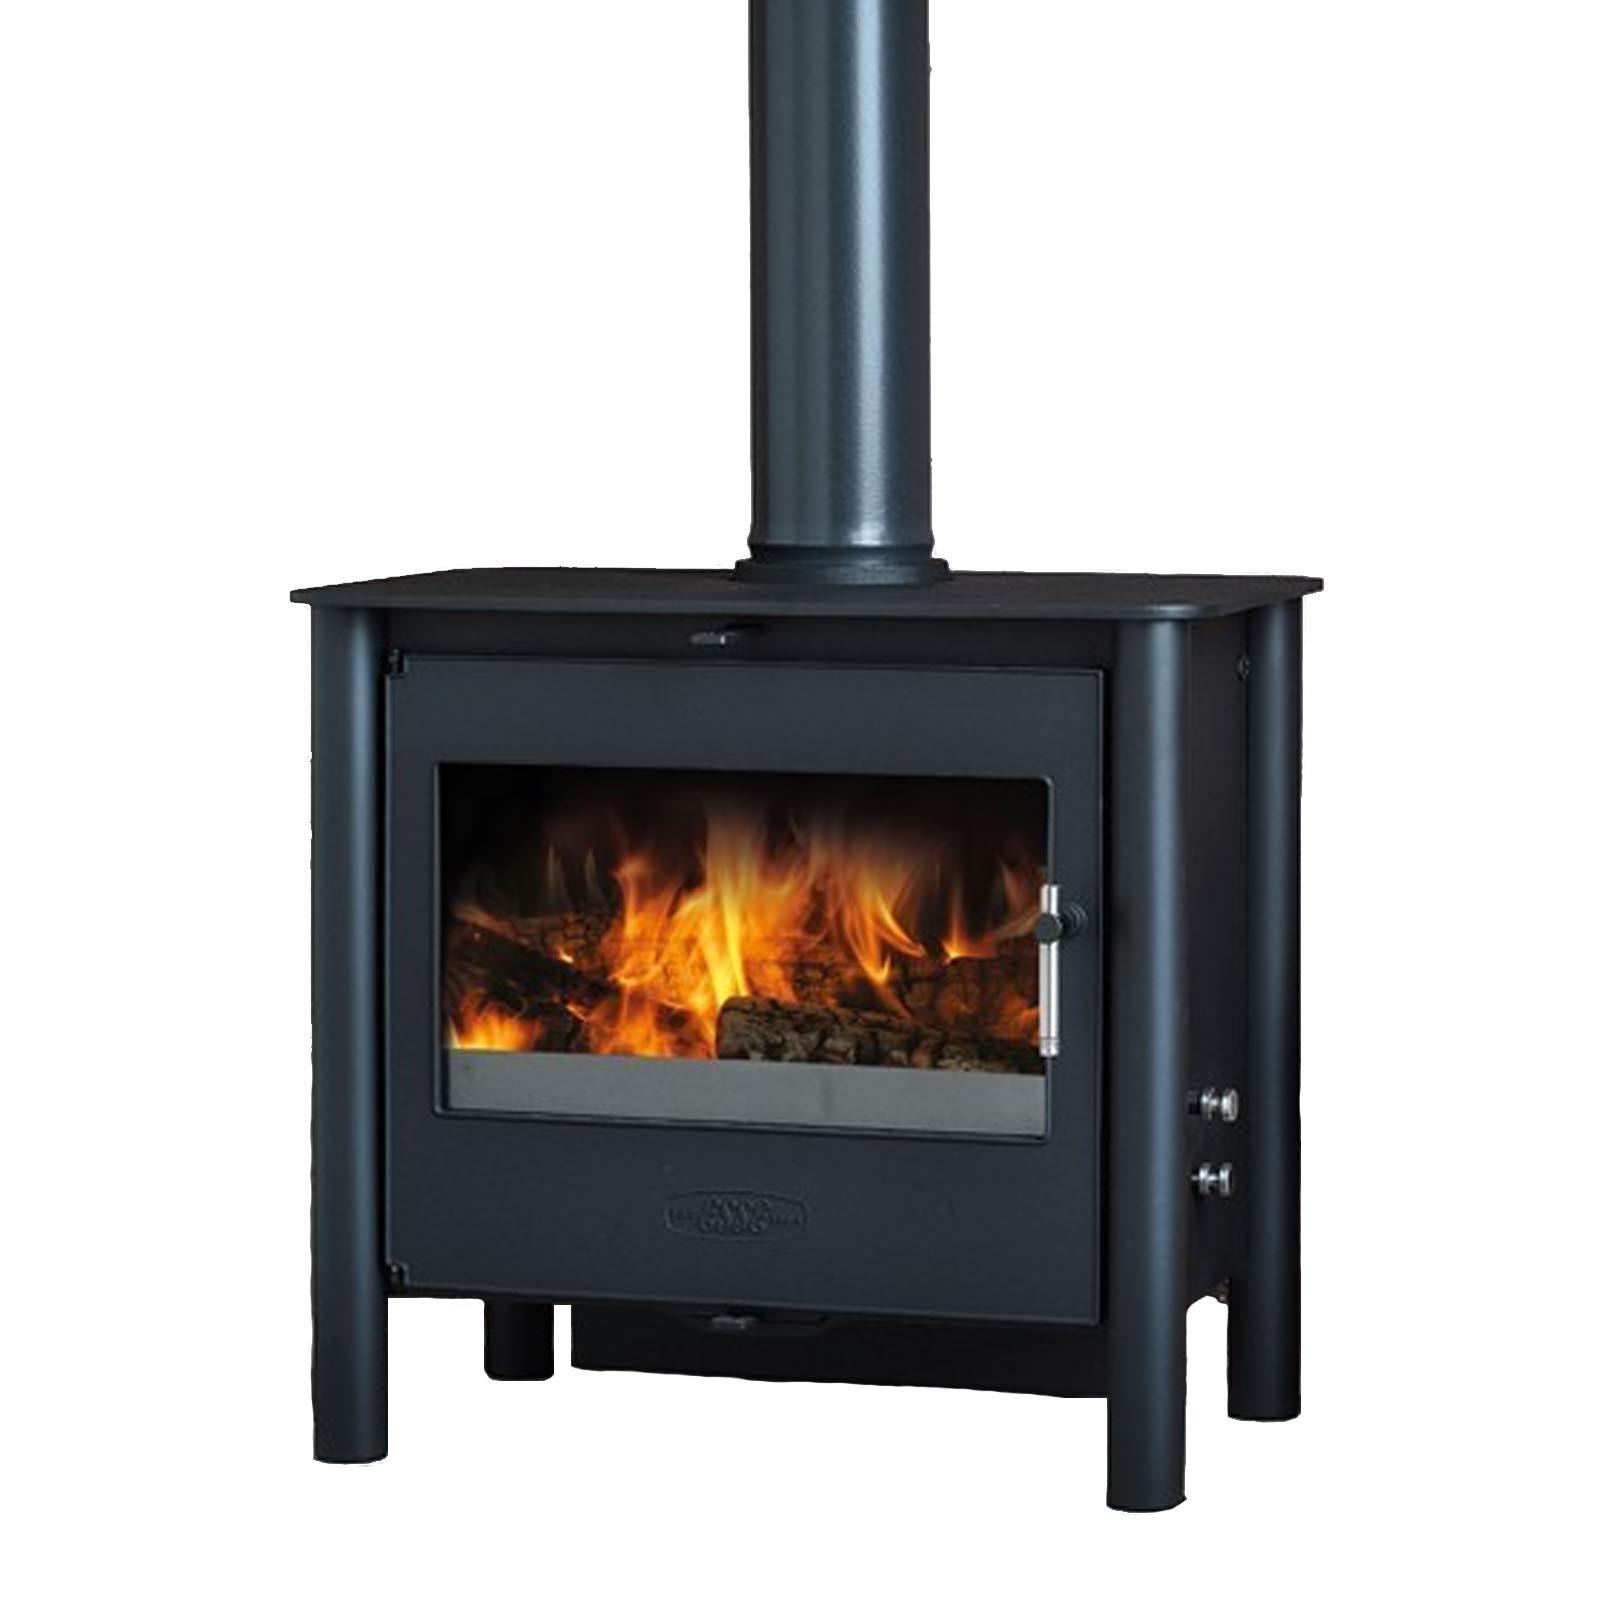 Unbeatable Uk Deals Esse 125 Multifuel Woodburning Gas